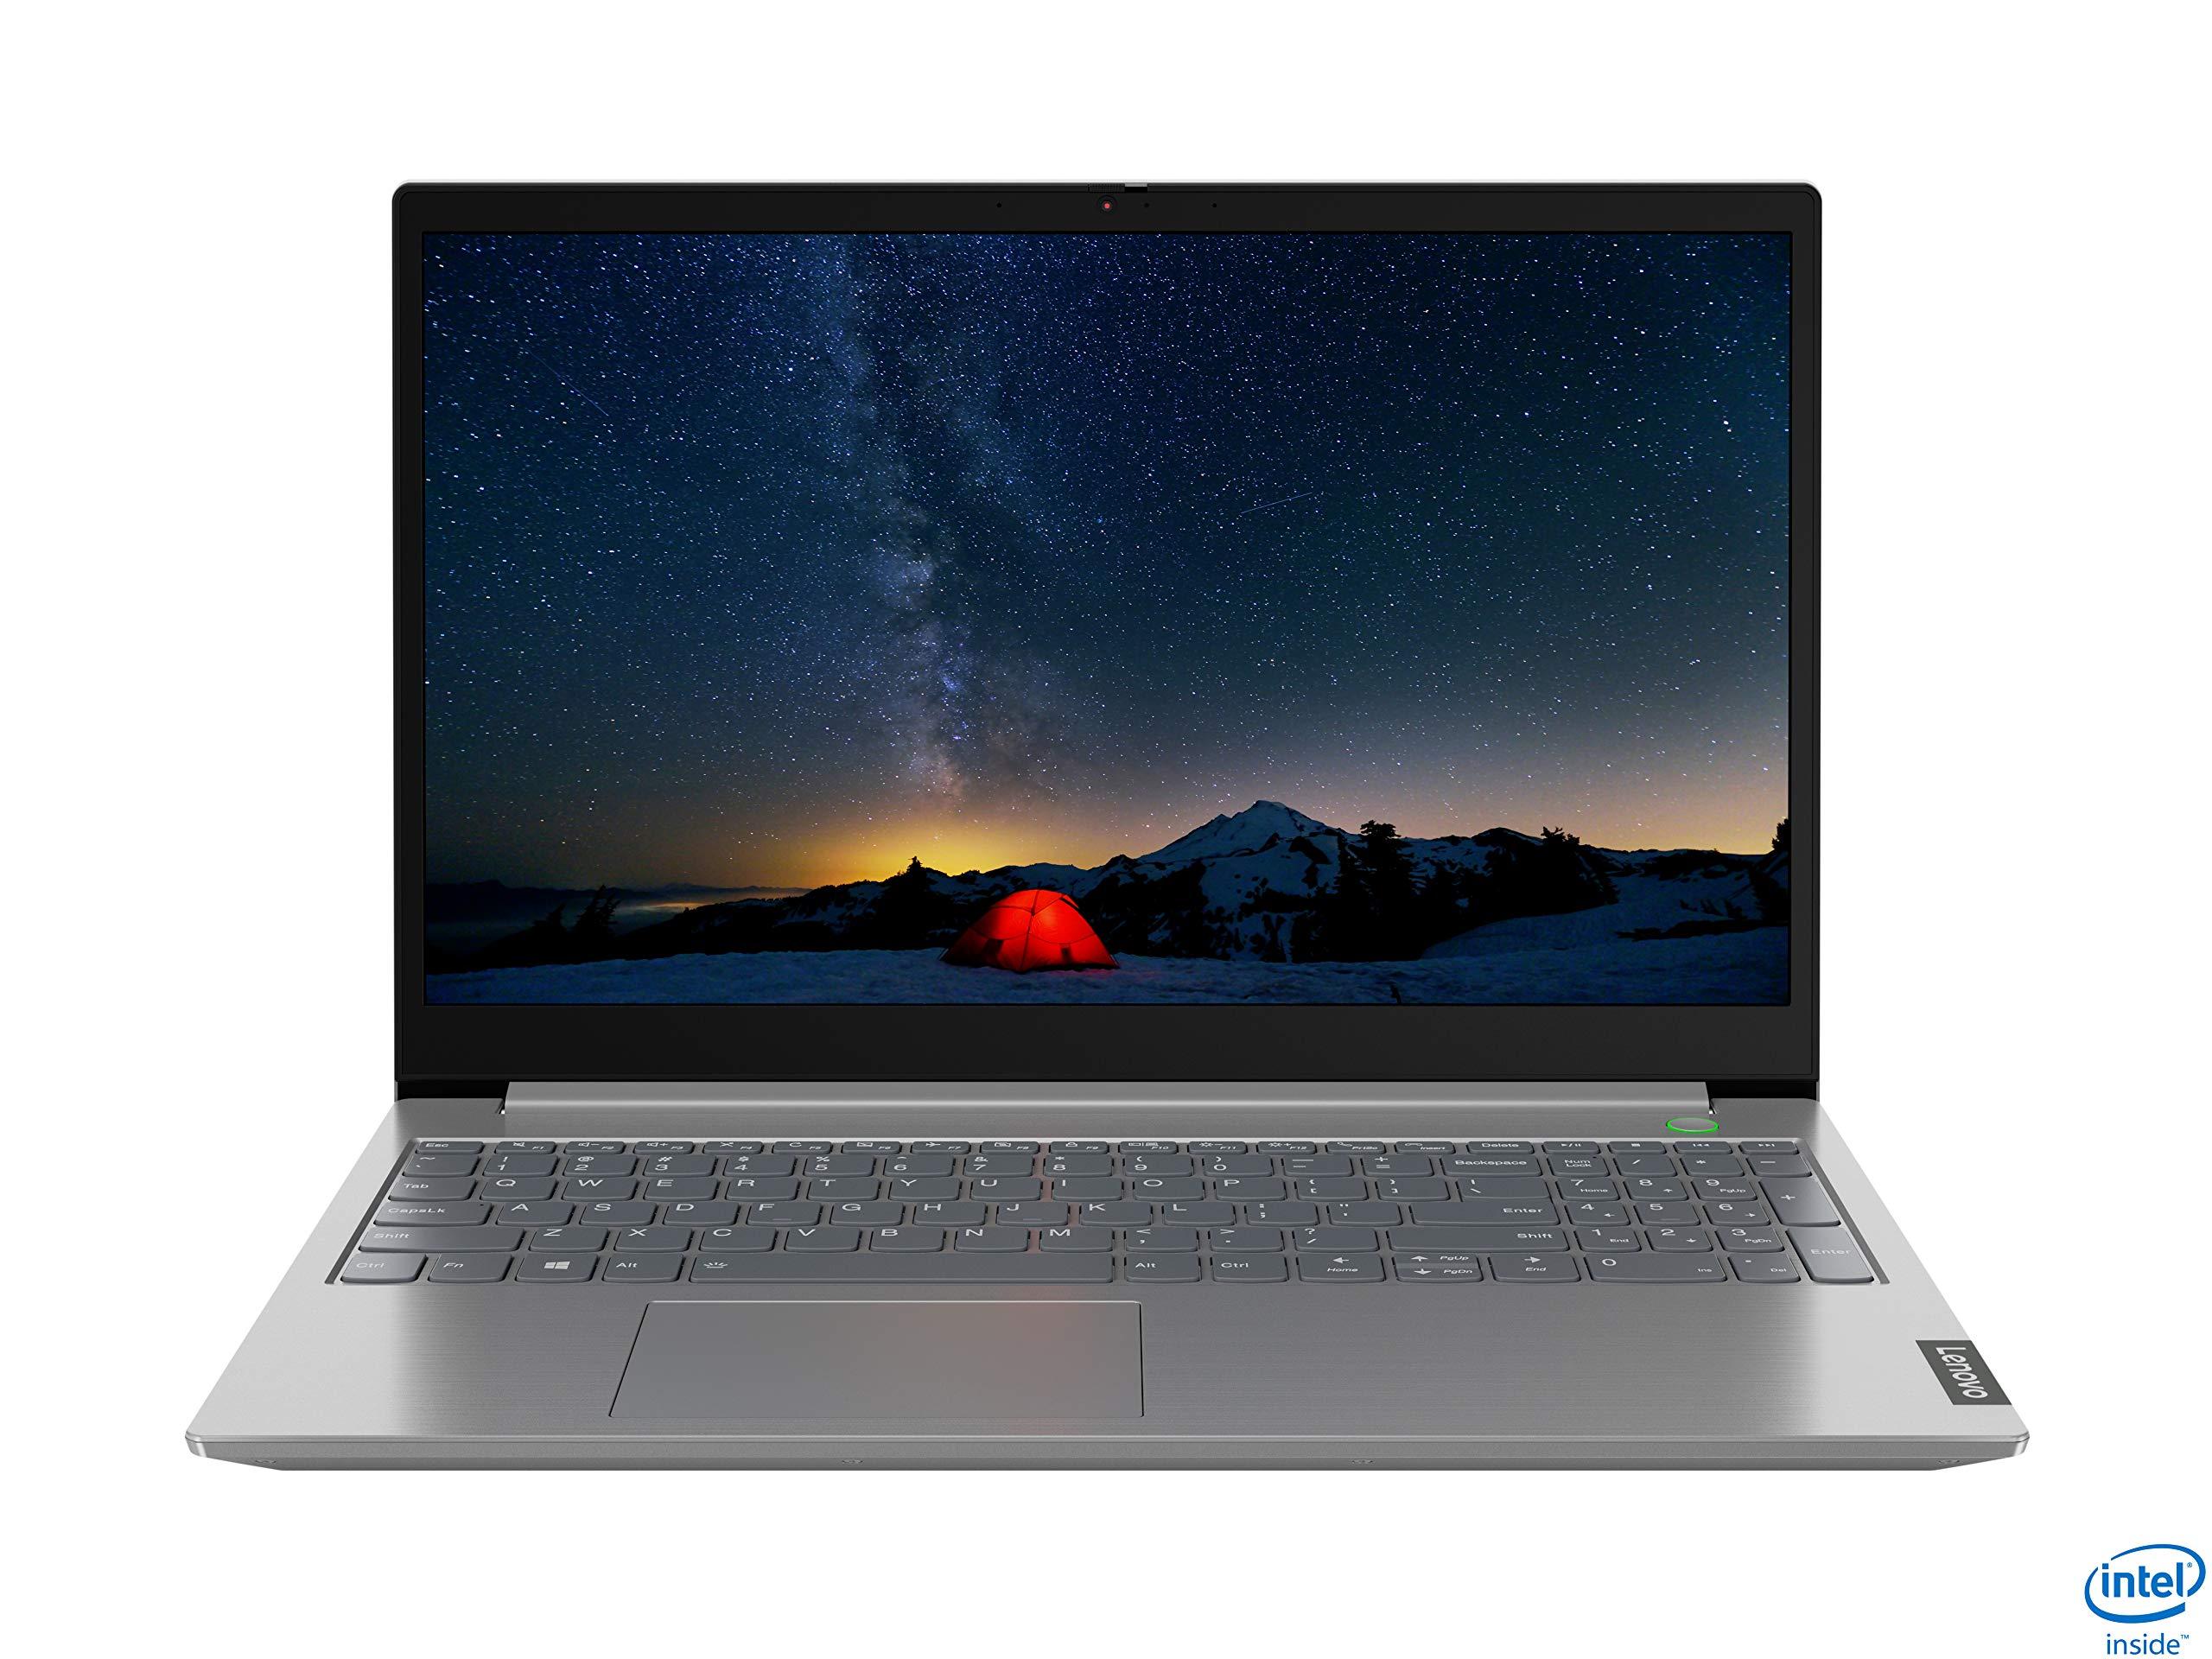 "VCI Lenovo ThinkBook 15-IML, Intel i7-10210U Quad Core, 16GB RAM, 512GB NVMe SSD, 15.6"" Screen, 1920 x 1080, Windows 10 Pro, 9 Hour Battery Run Time"